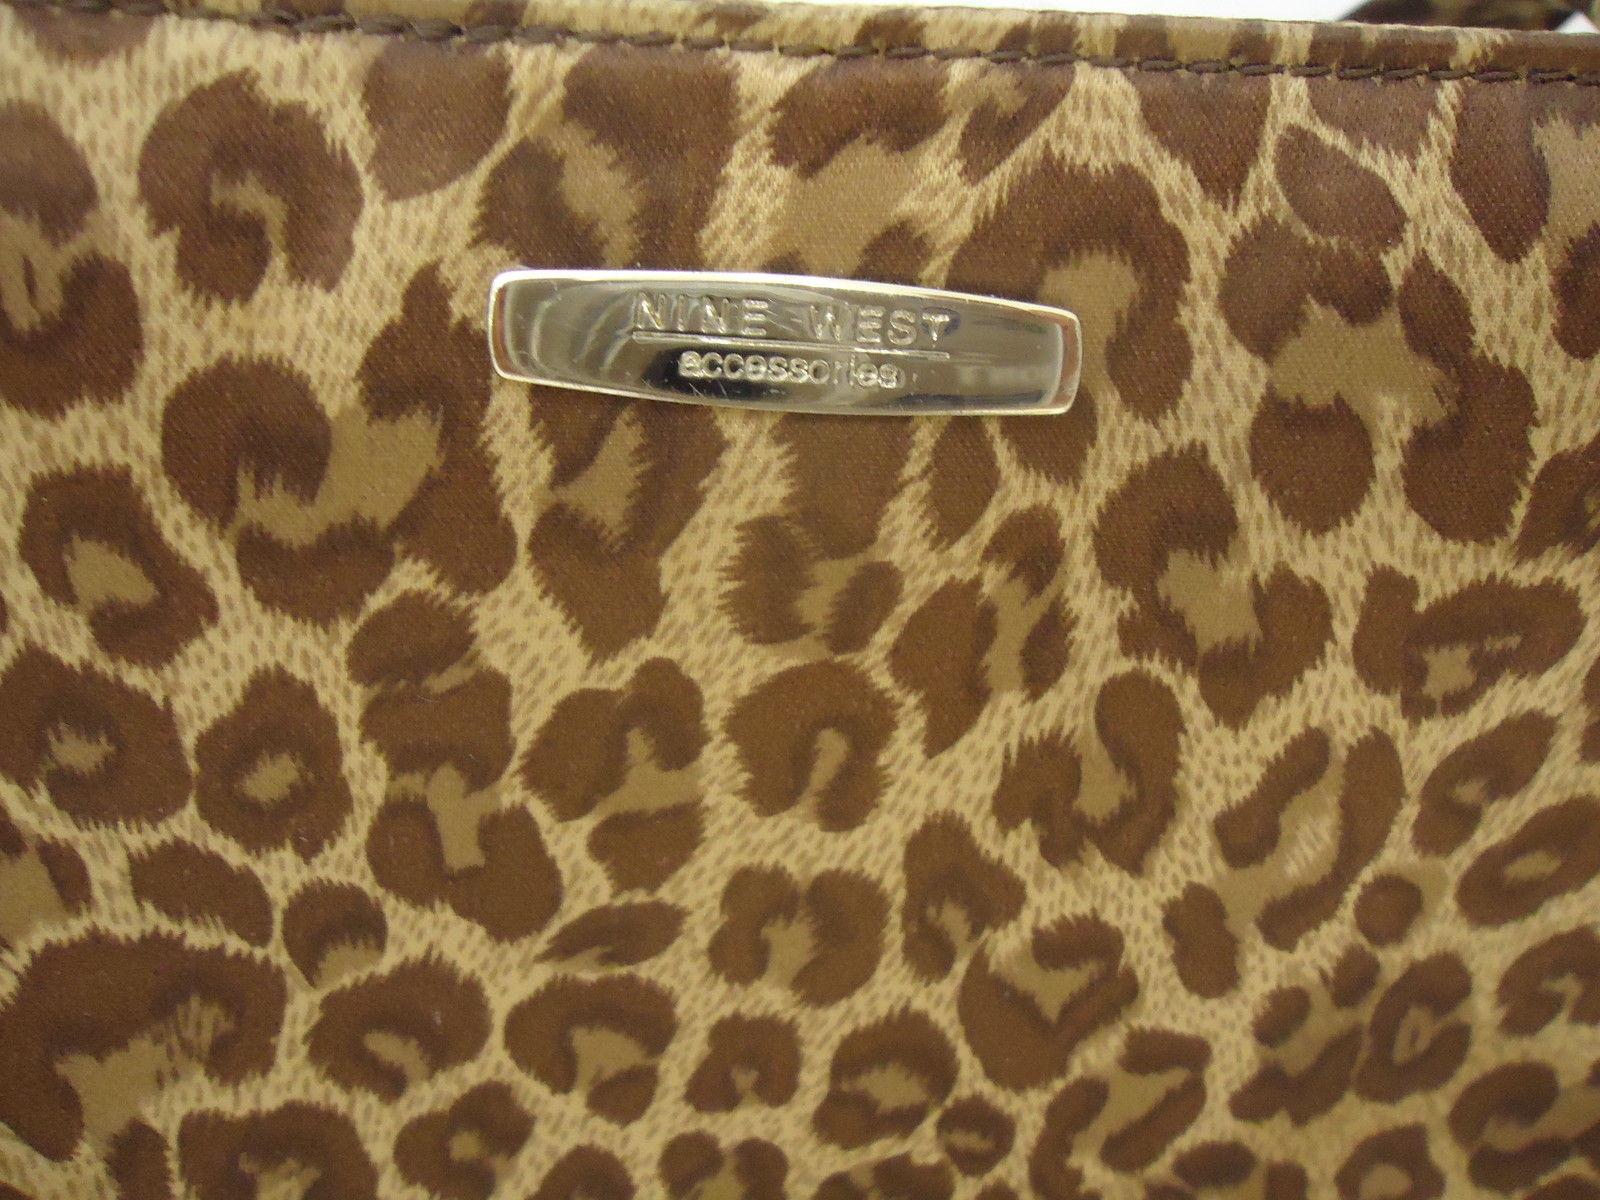 Animal Print Shoulder Bag from Nine West Accessories